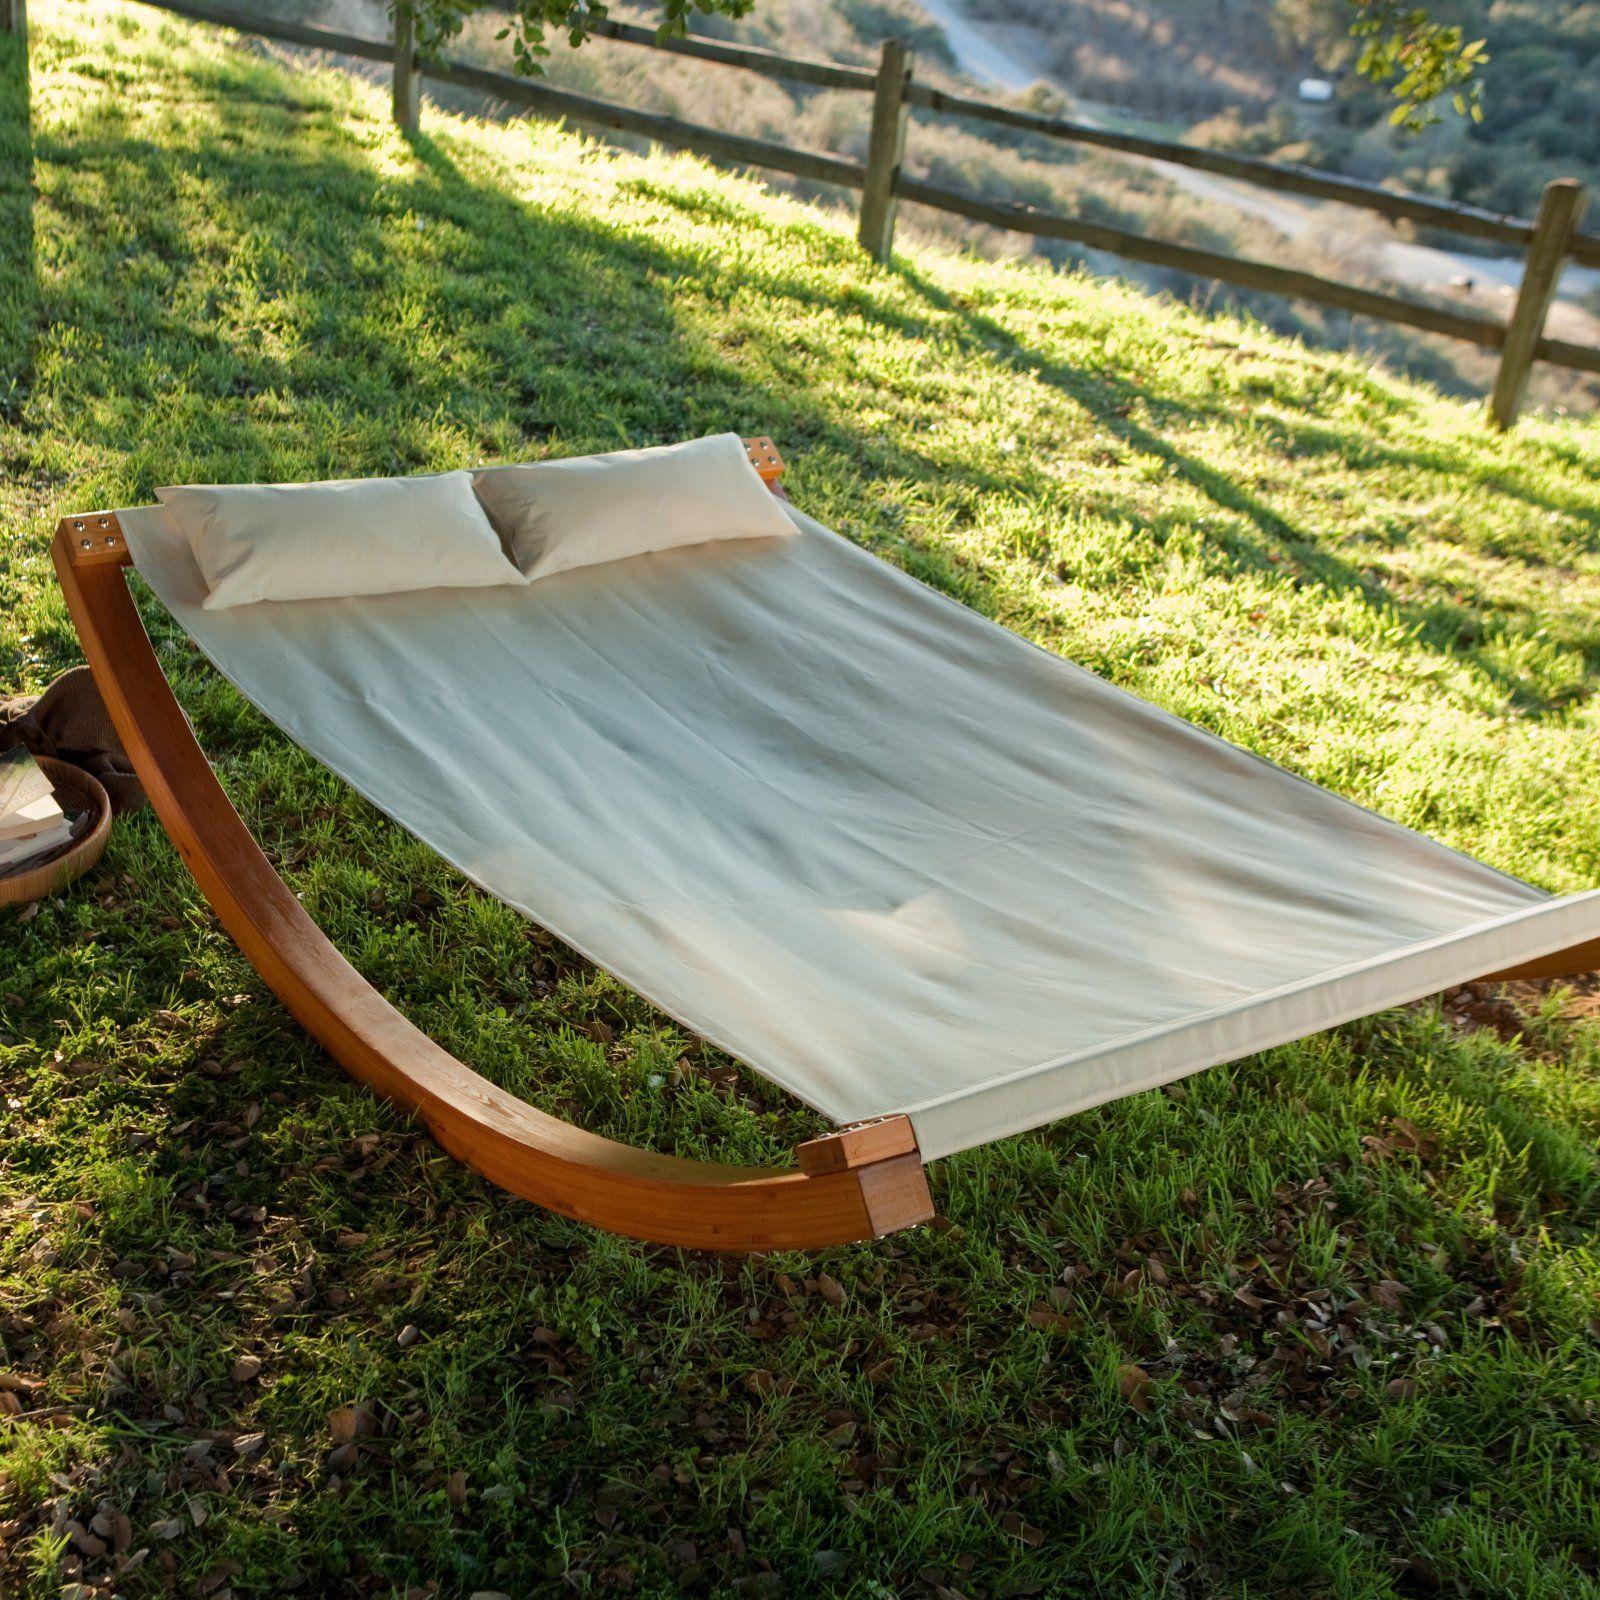 Island bay wave rocker hammock beige at the foundary things i